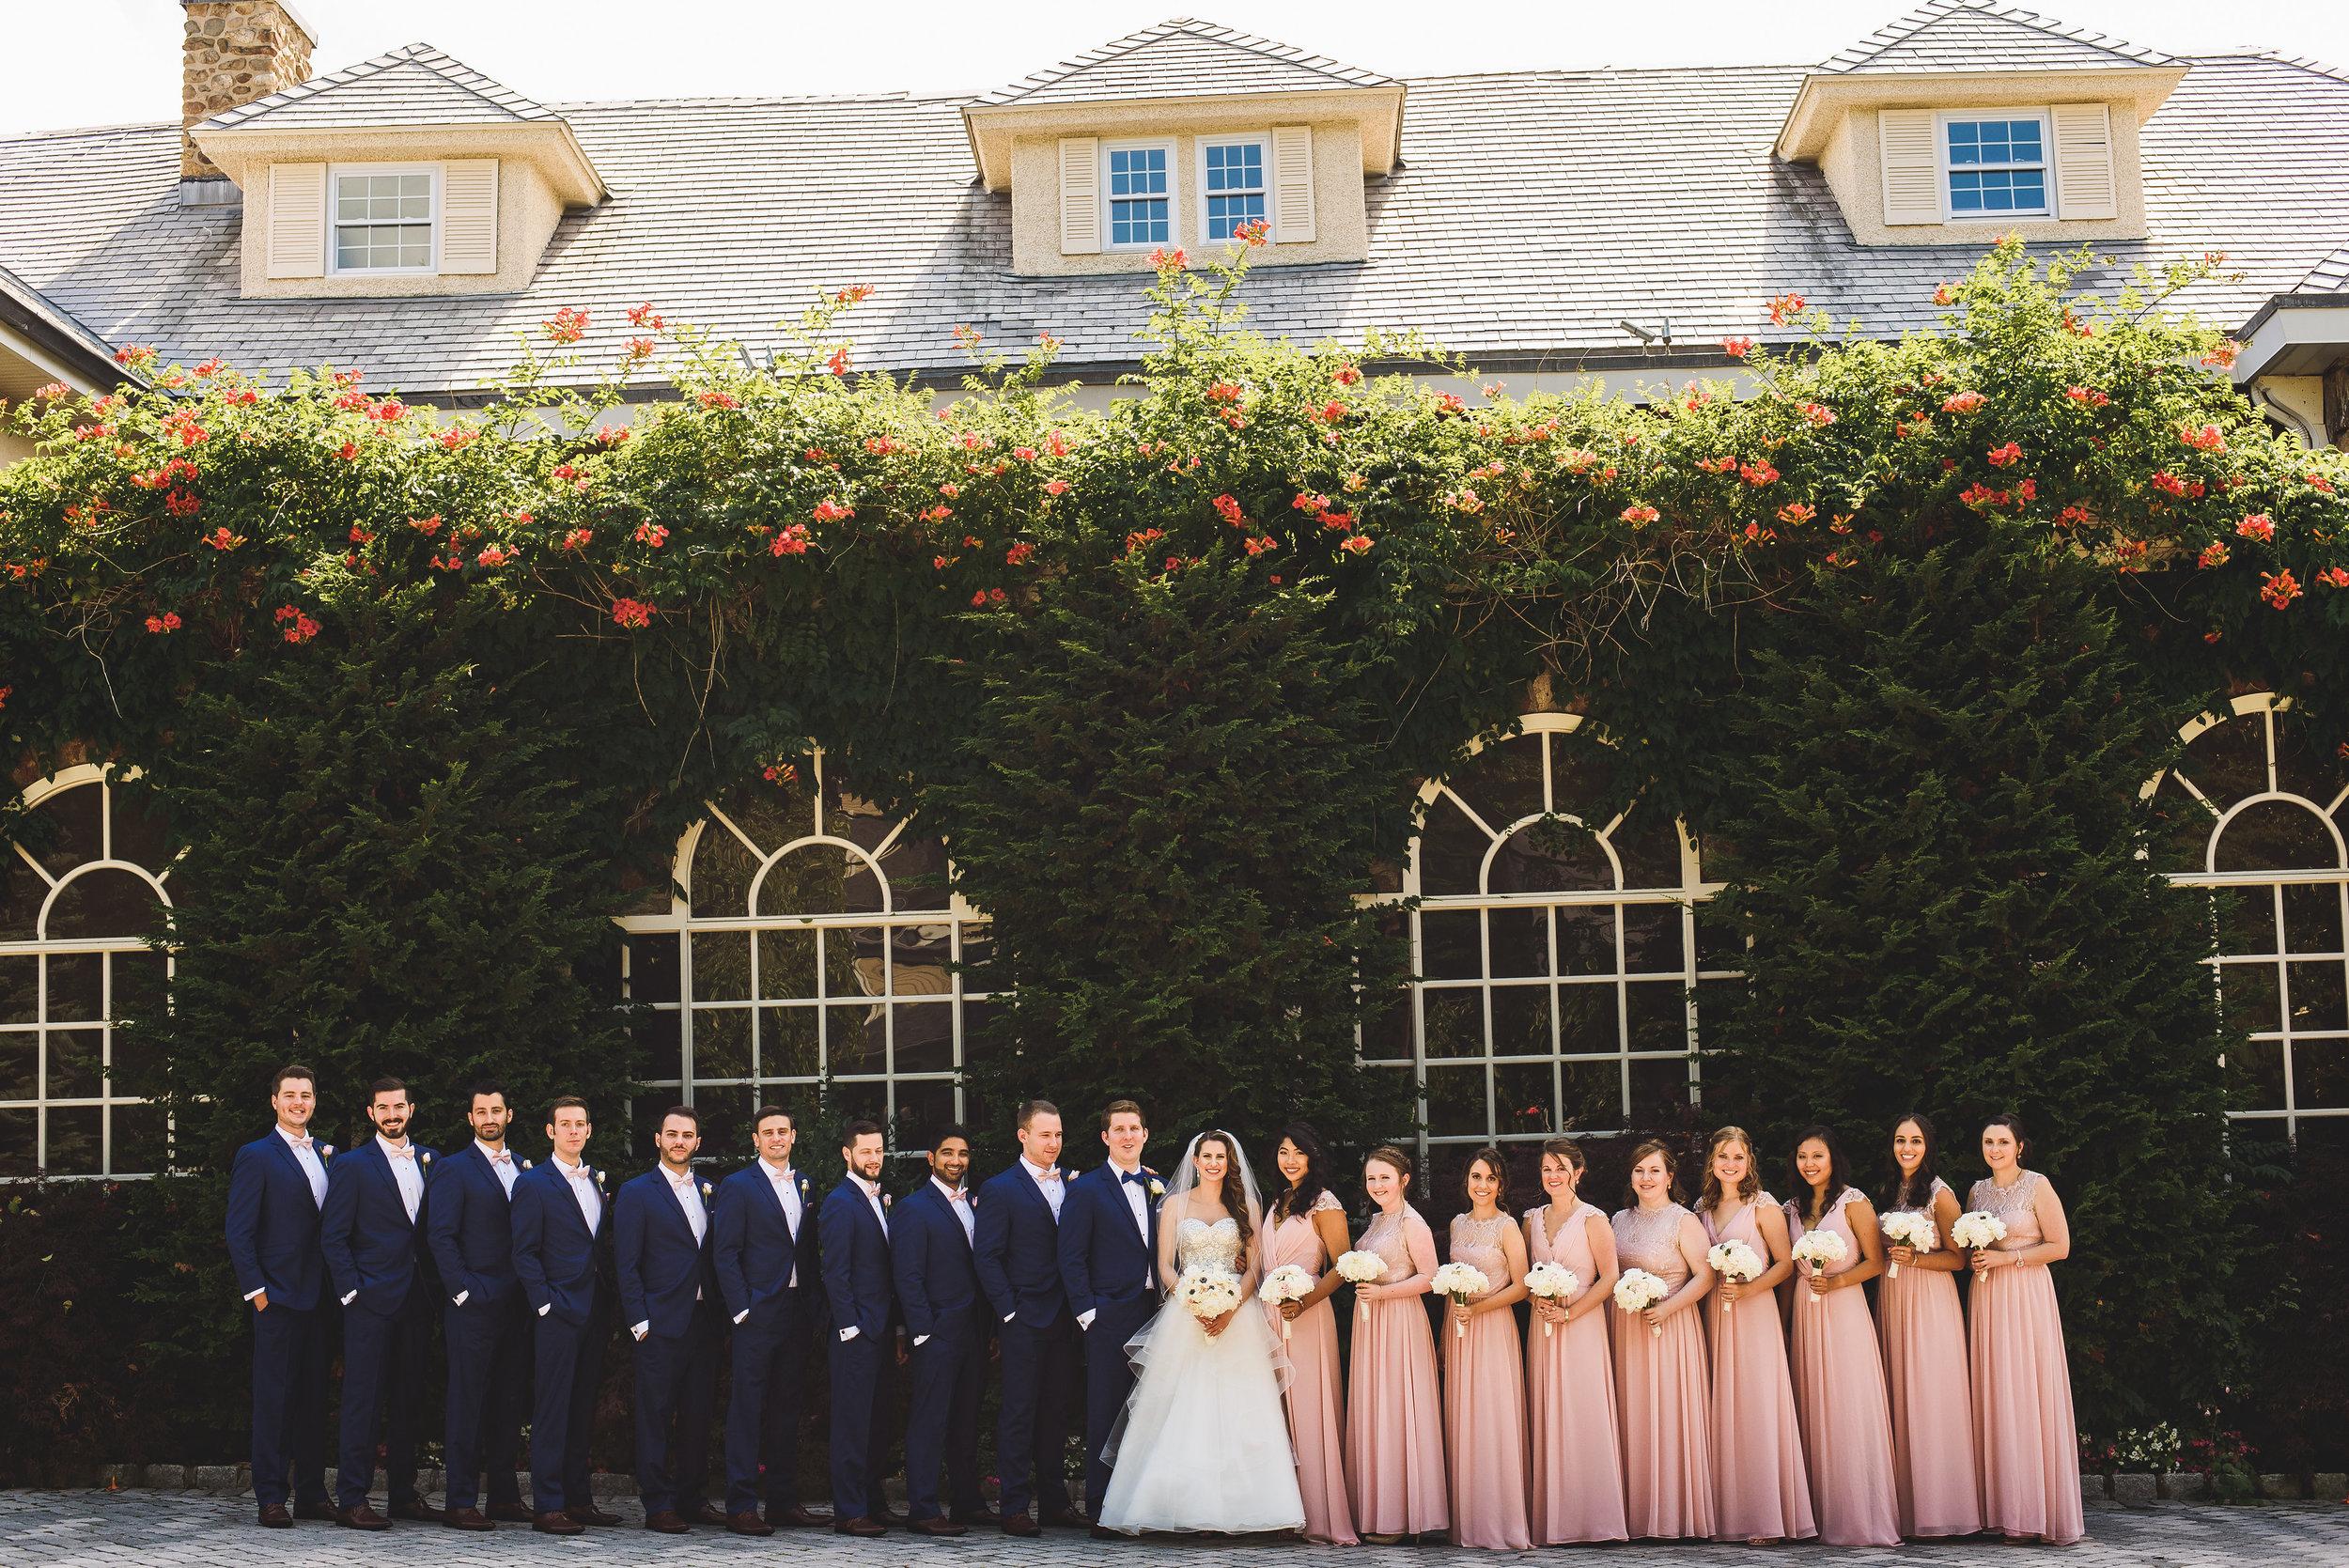 Elise-Ben-Wedding-261.jpg